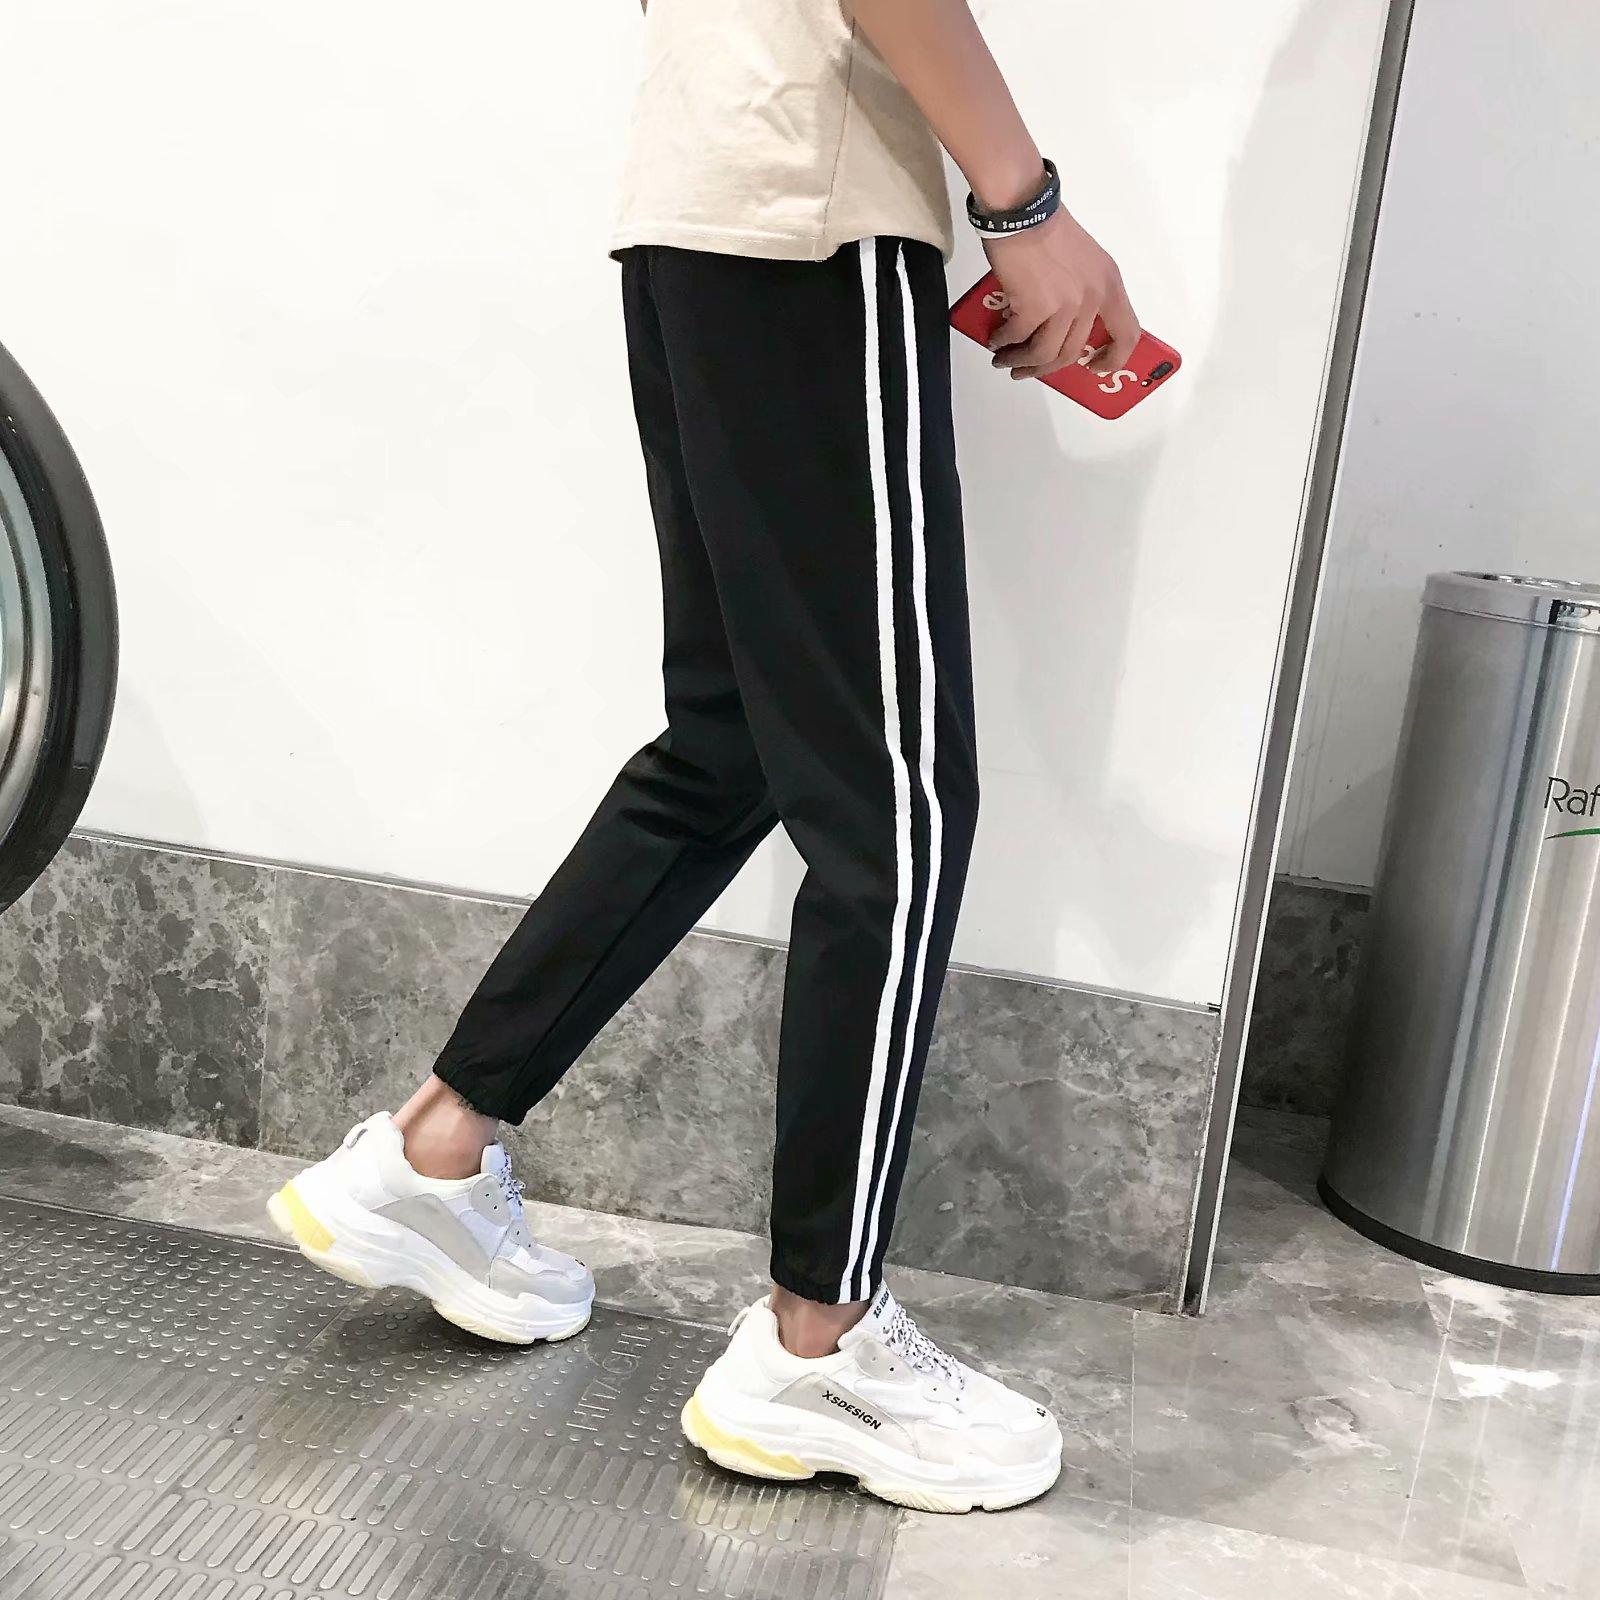 Plus-sized Sweatpants Men'S Wear Thin Athletic Pants Skinny Loose Fat Casual Pants Beam Leg Capri Pants